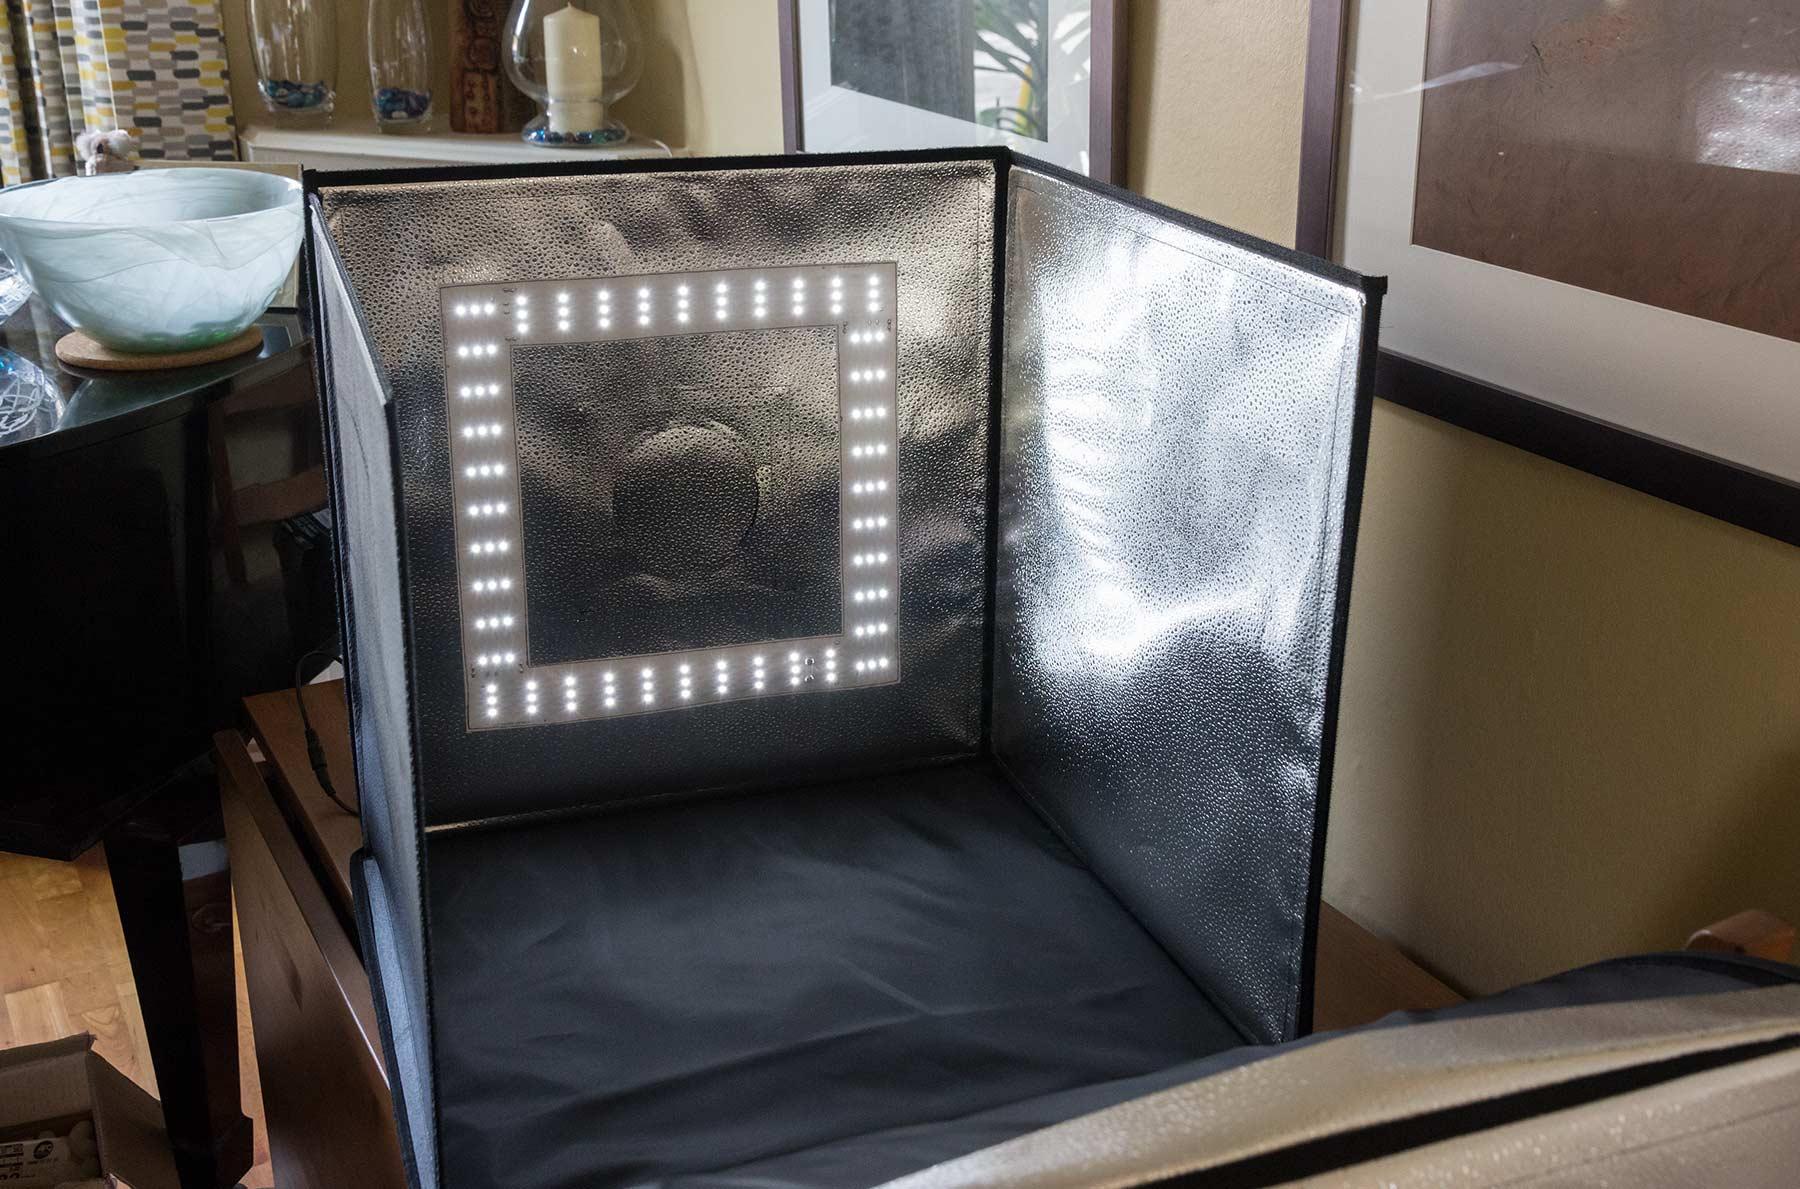 testing-lights